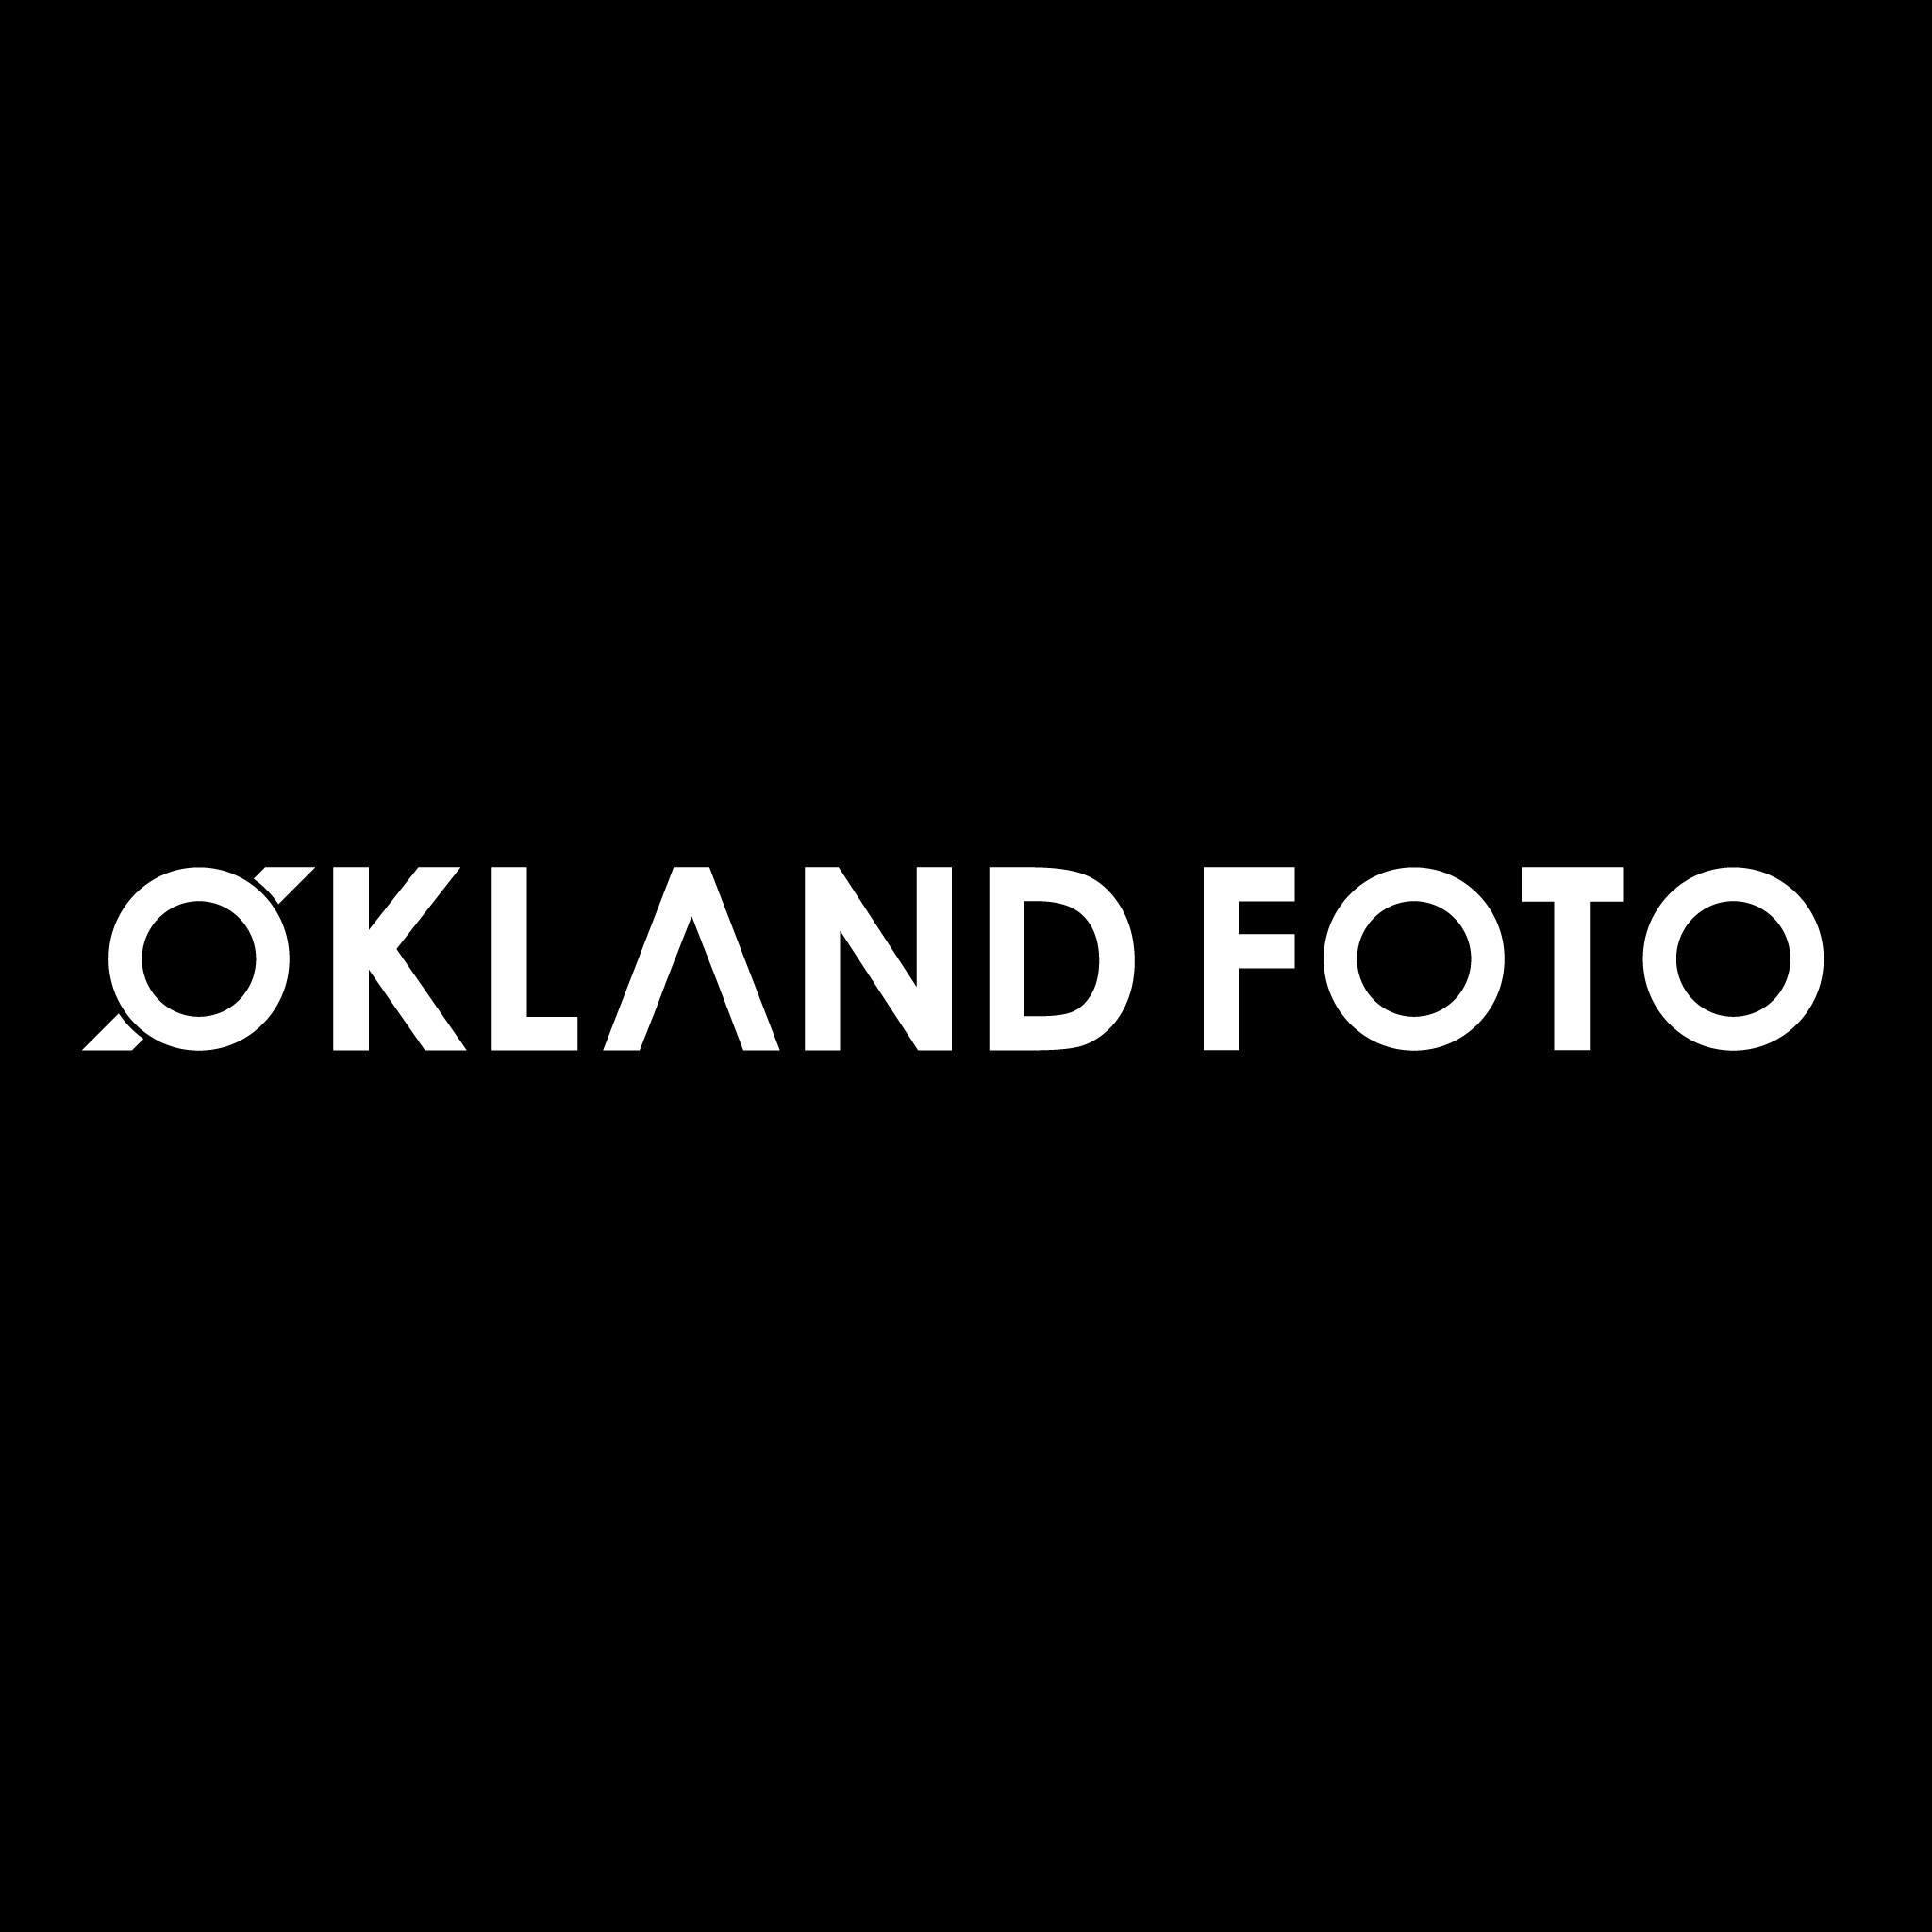 Økland Foto